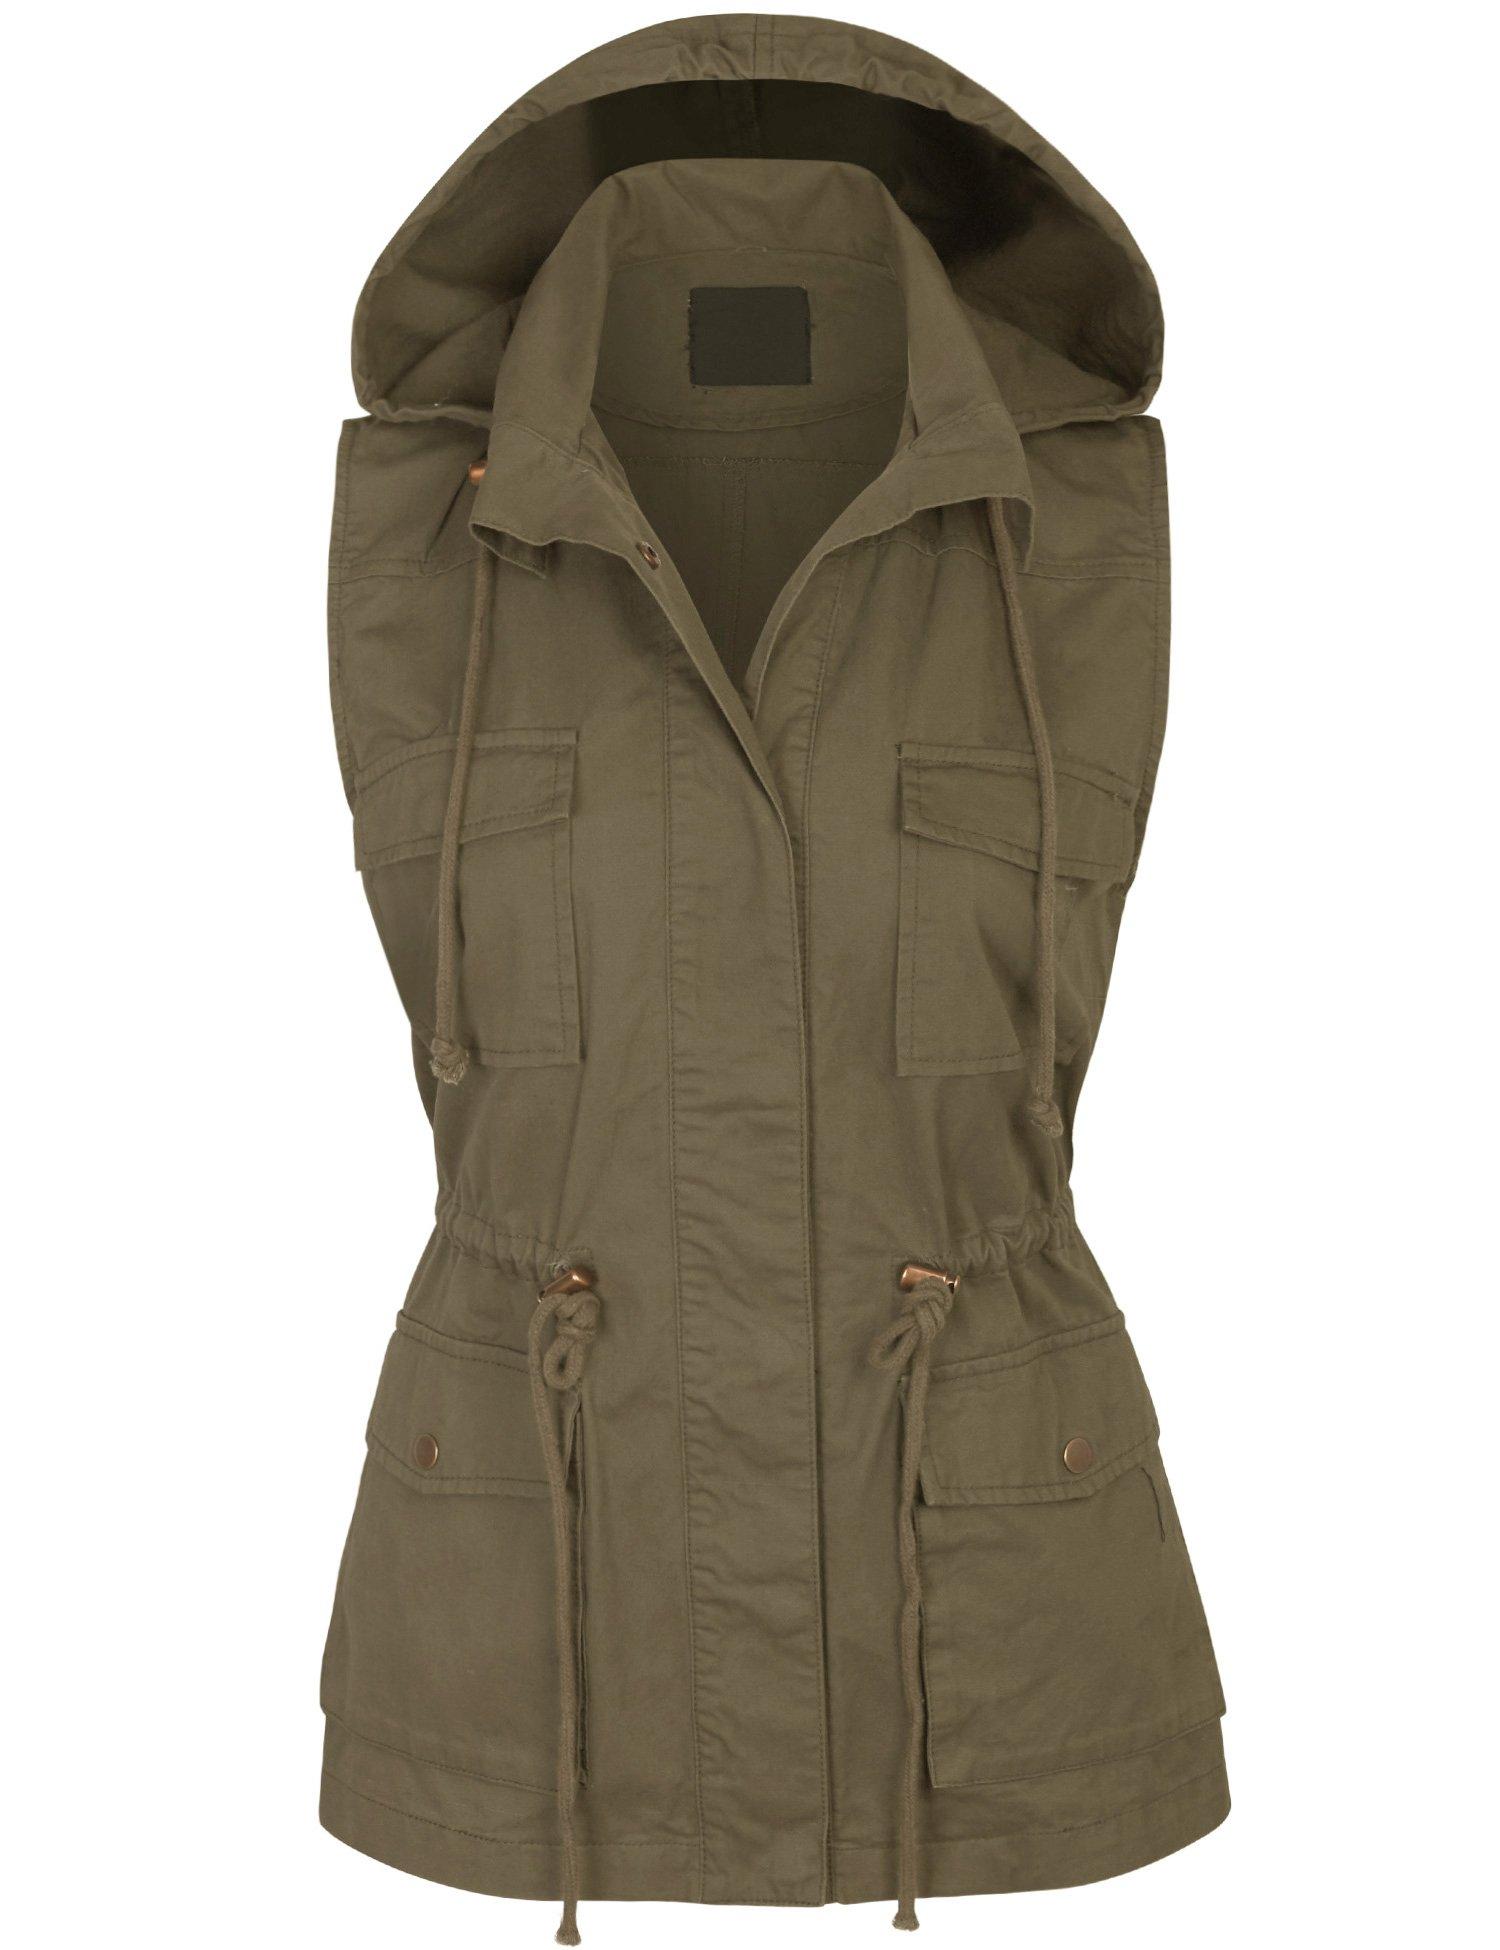 KOGMO Womens Military Anorak Safari Utility Vest with Hood-S-Olive